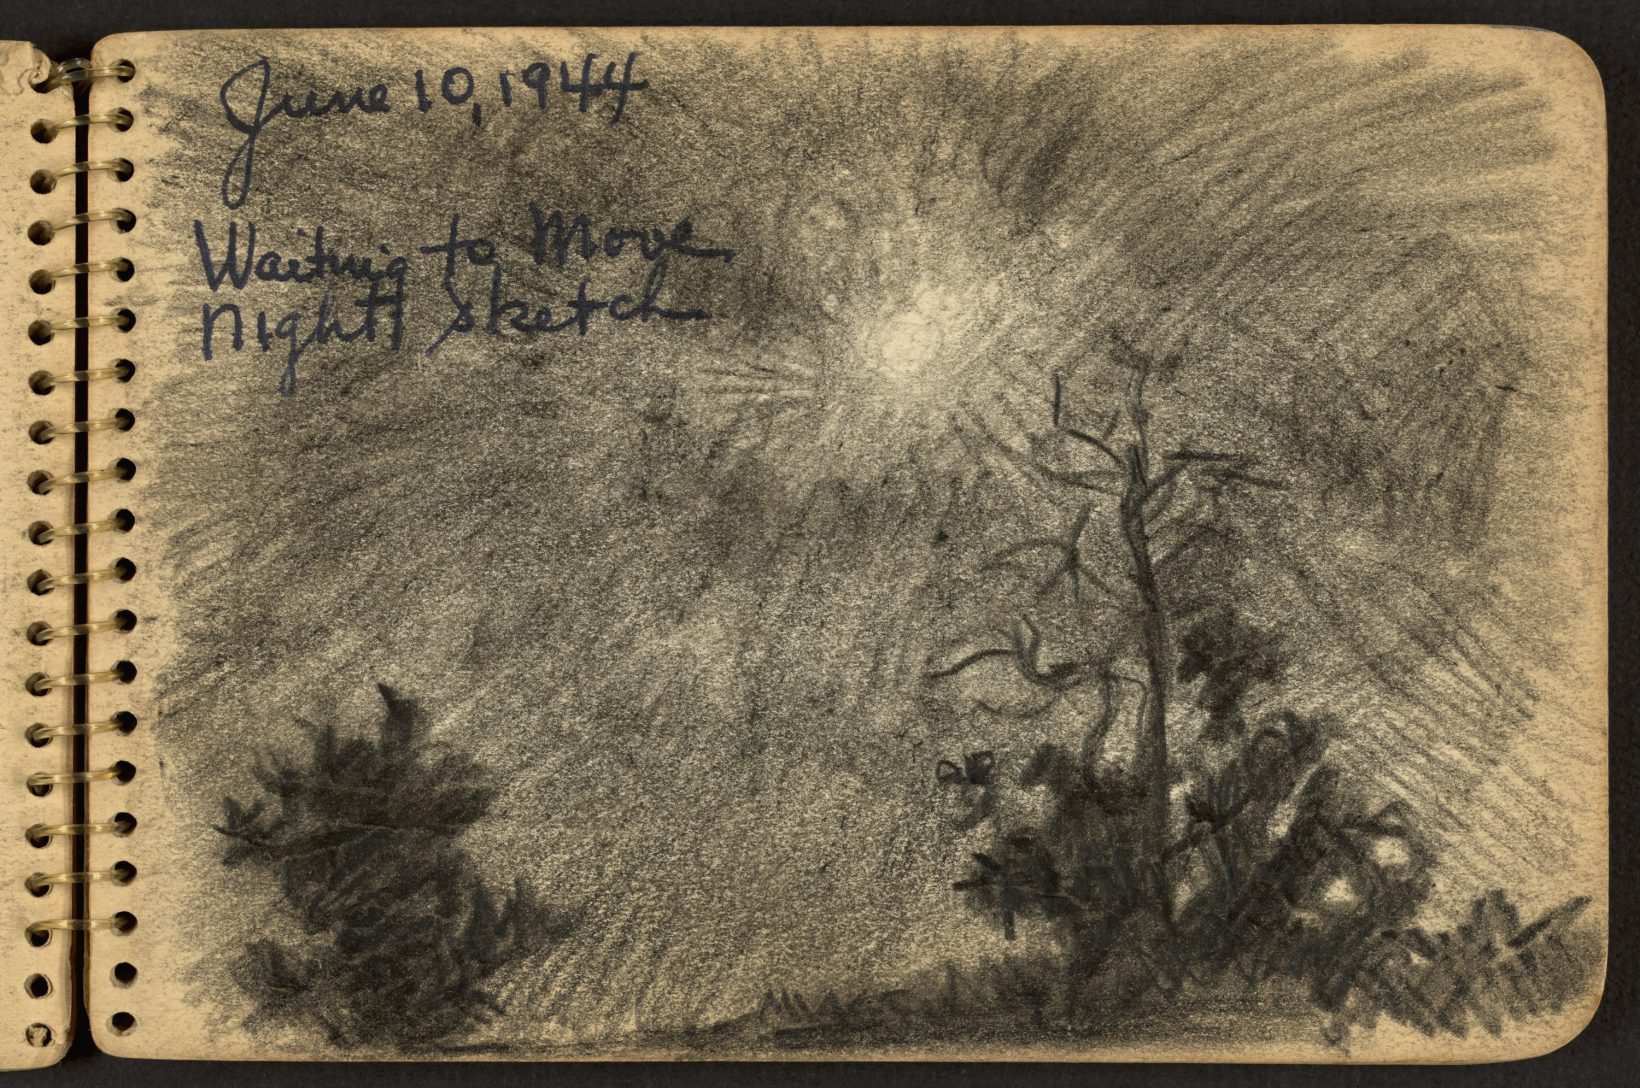 victor-lundy-carnet-croquis-seconde-guerre-mondiale-20